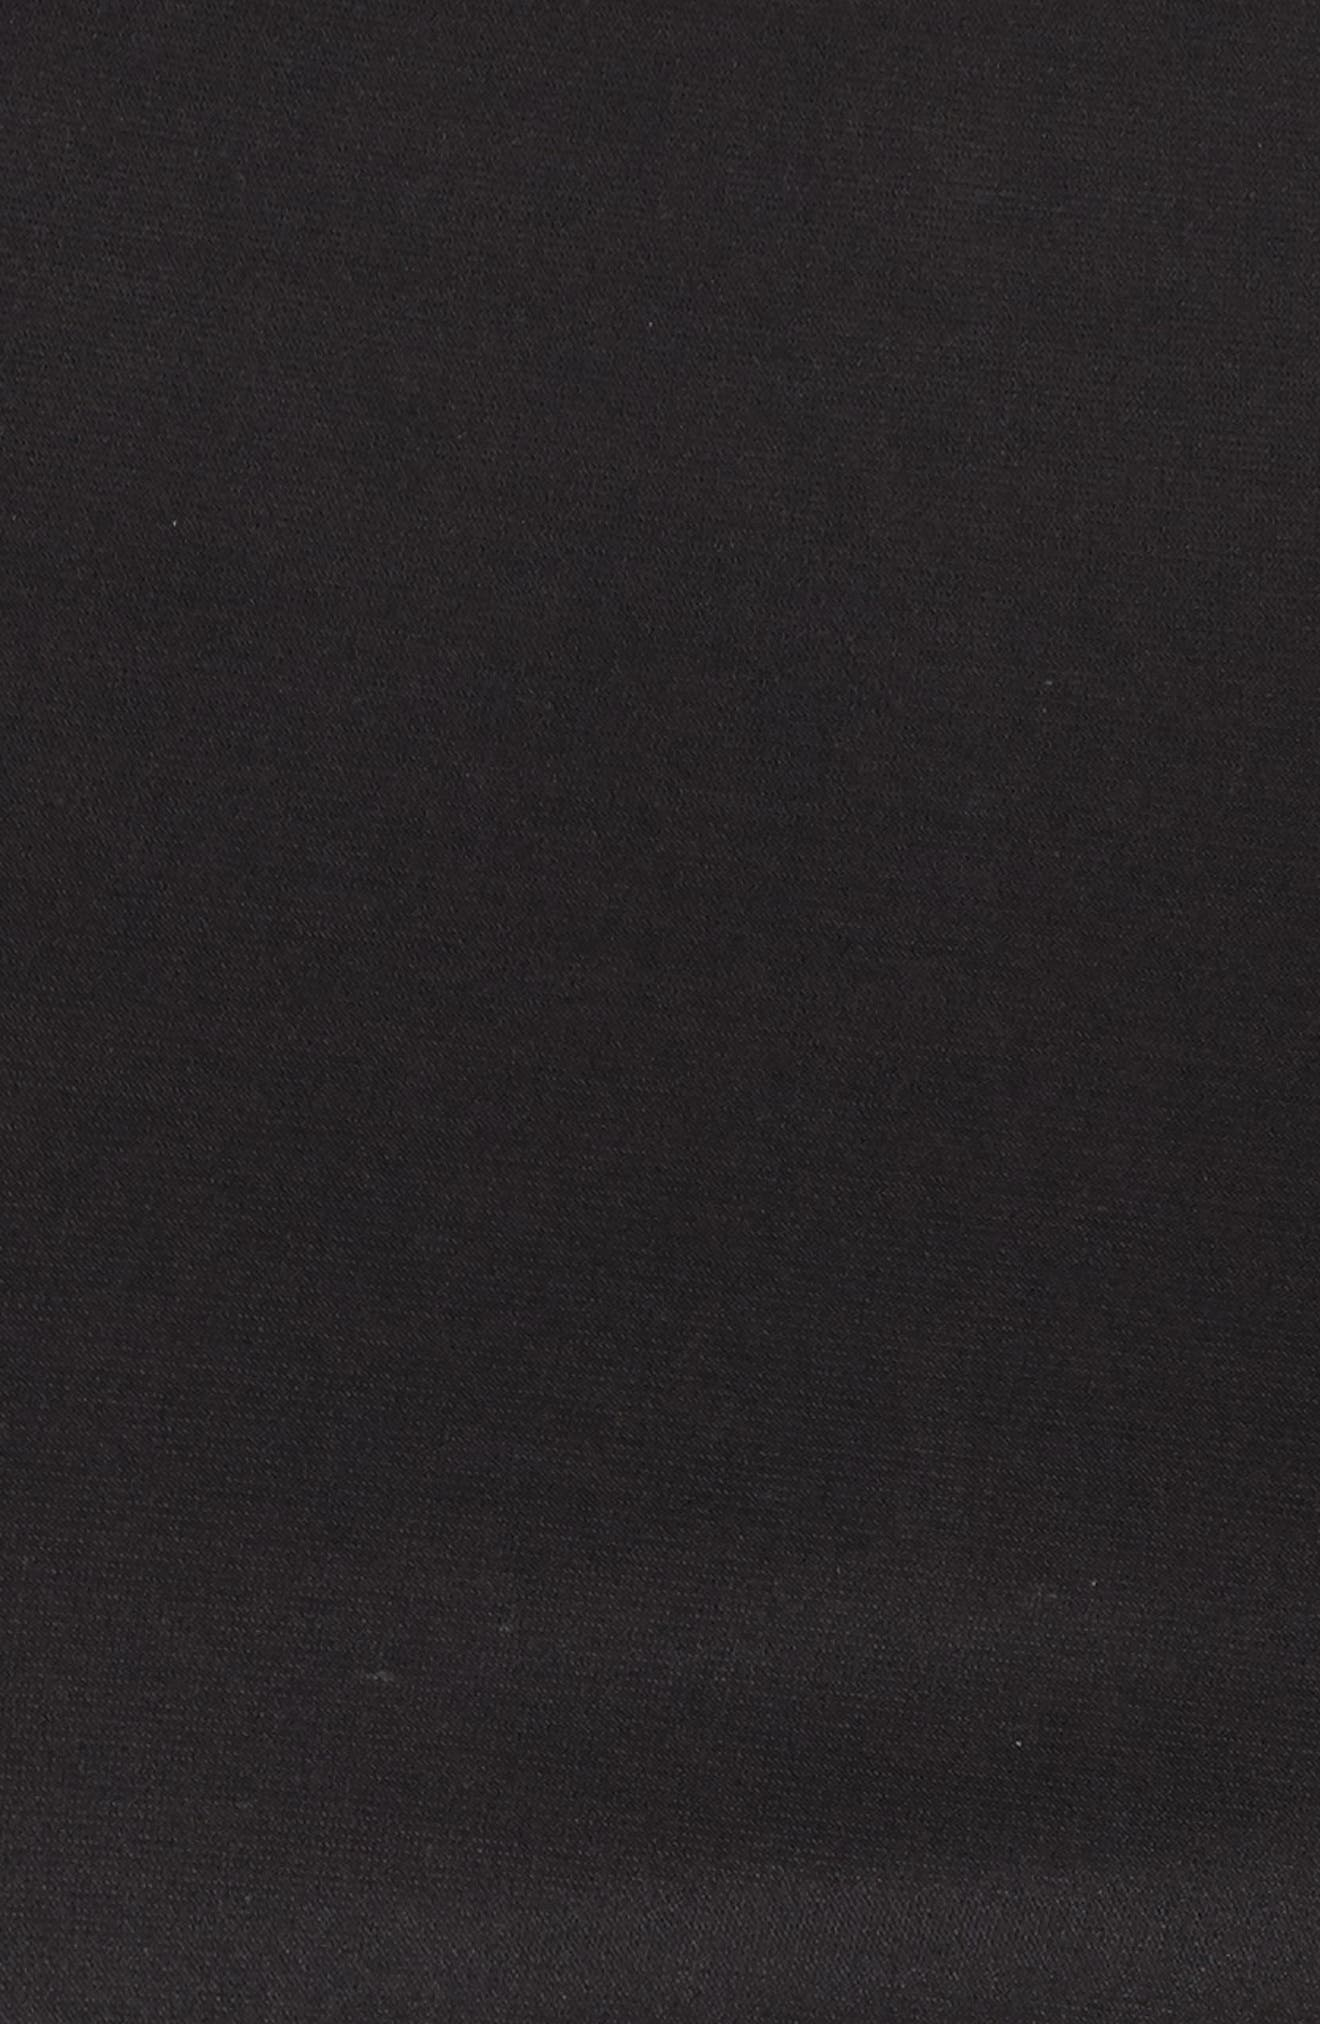 Illusion Yoke Bell Sleeve Sheath Dress,                             Alternate thumbnail 5, color,